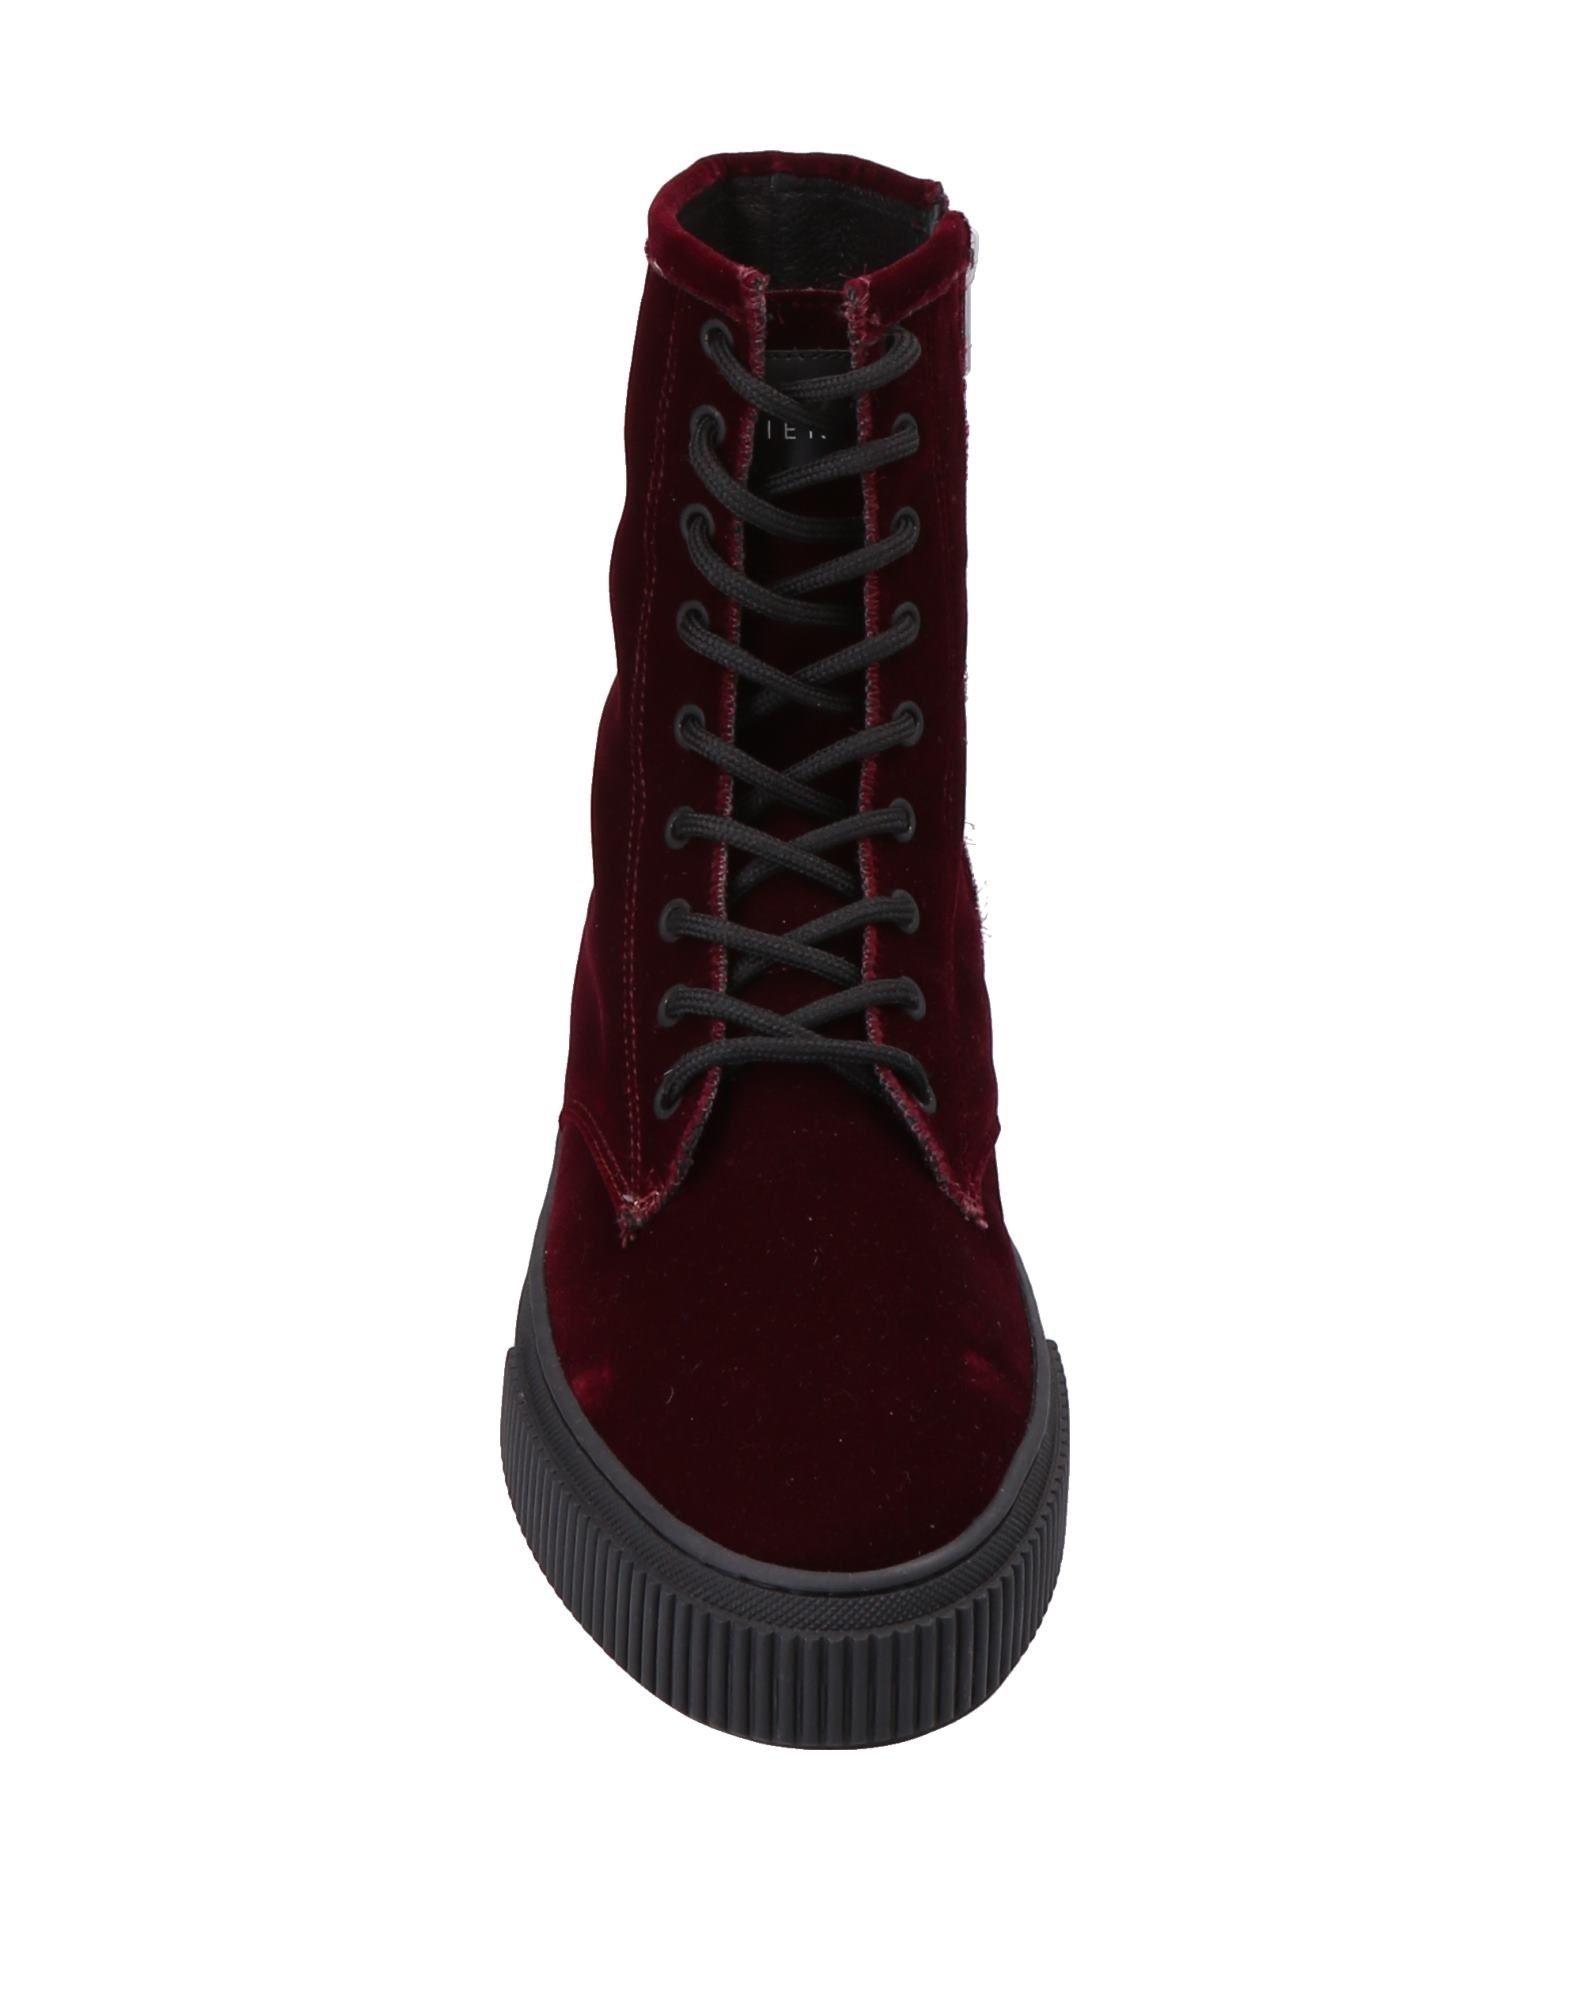 Stilvolle billige  Schuhe Metalgienchi Stiefelette Damen  billige 11526501PJ 4baf51